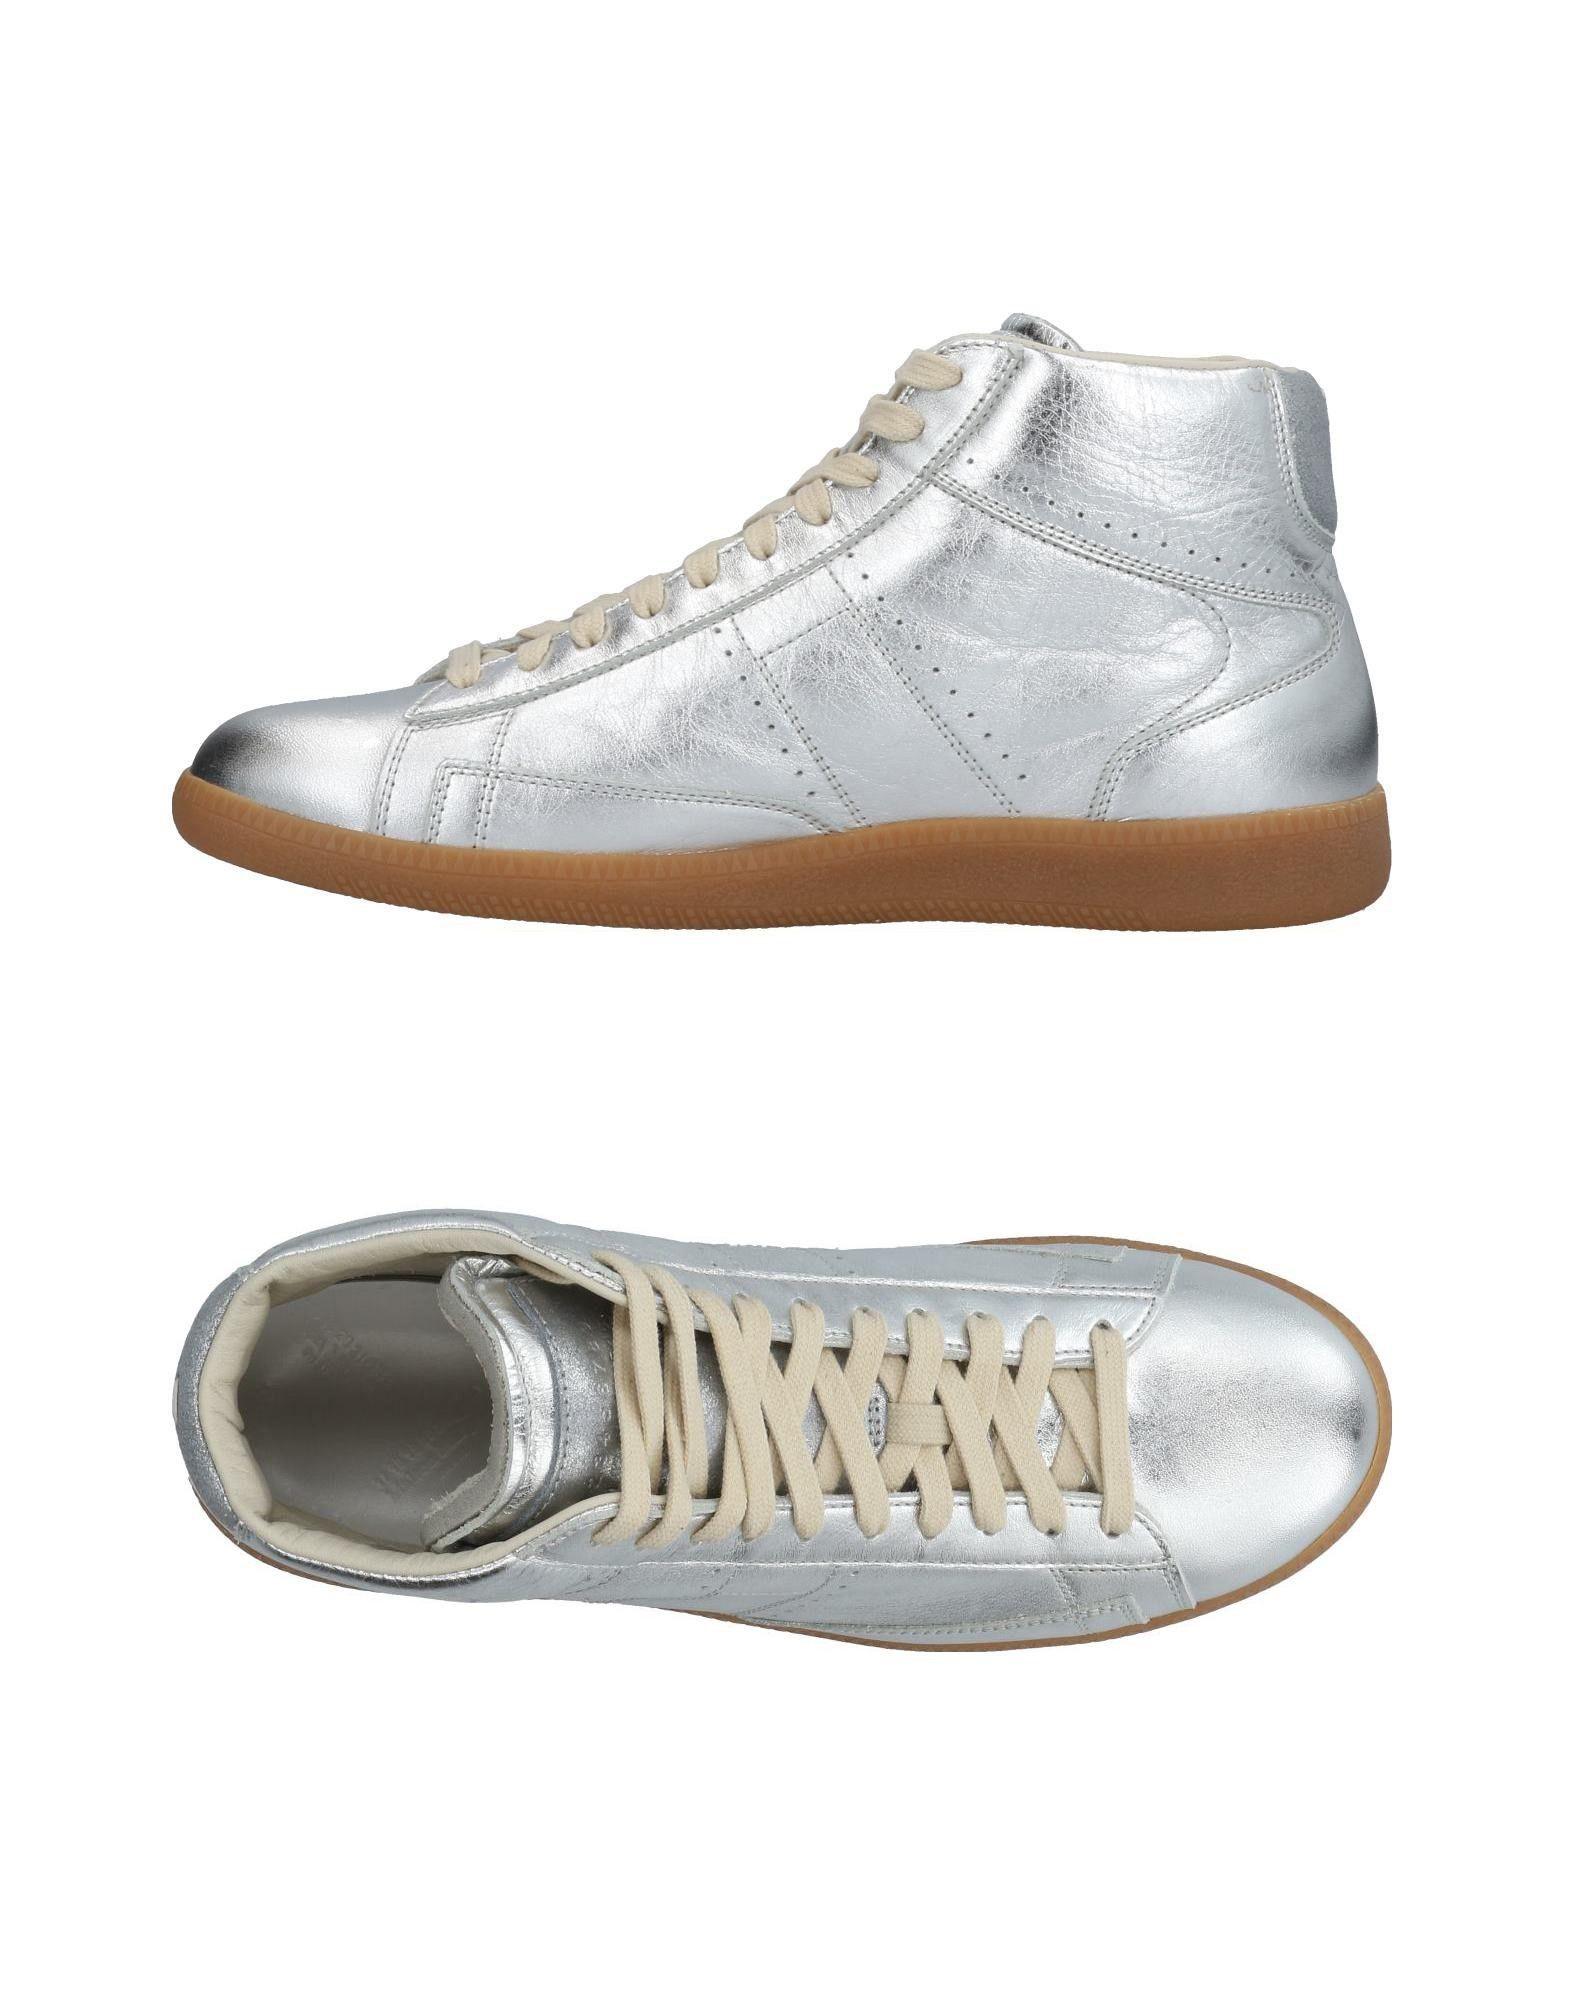 Maison Margiela Sneakers Herren  11429356OL Gute Qualität beliebte Schuhe